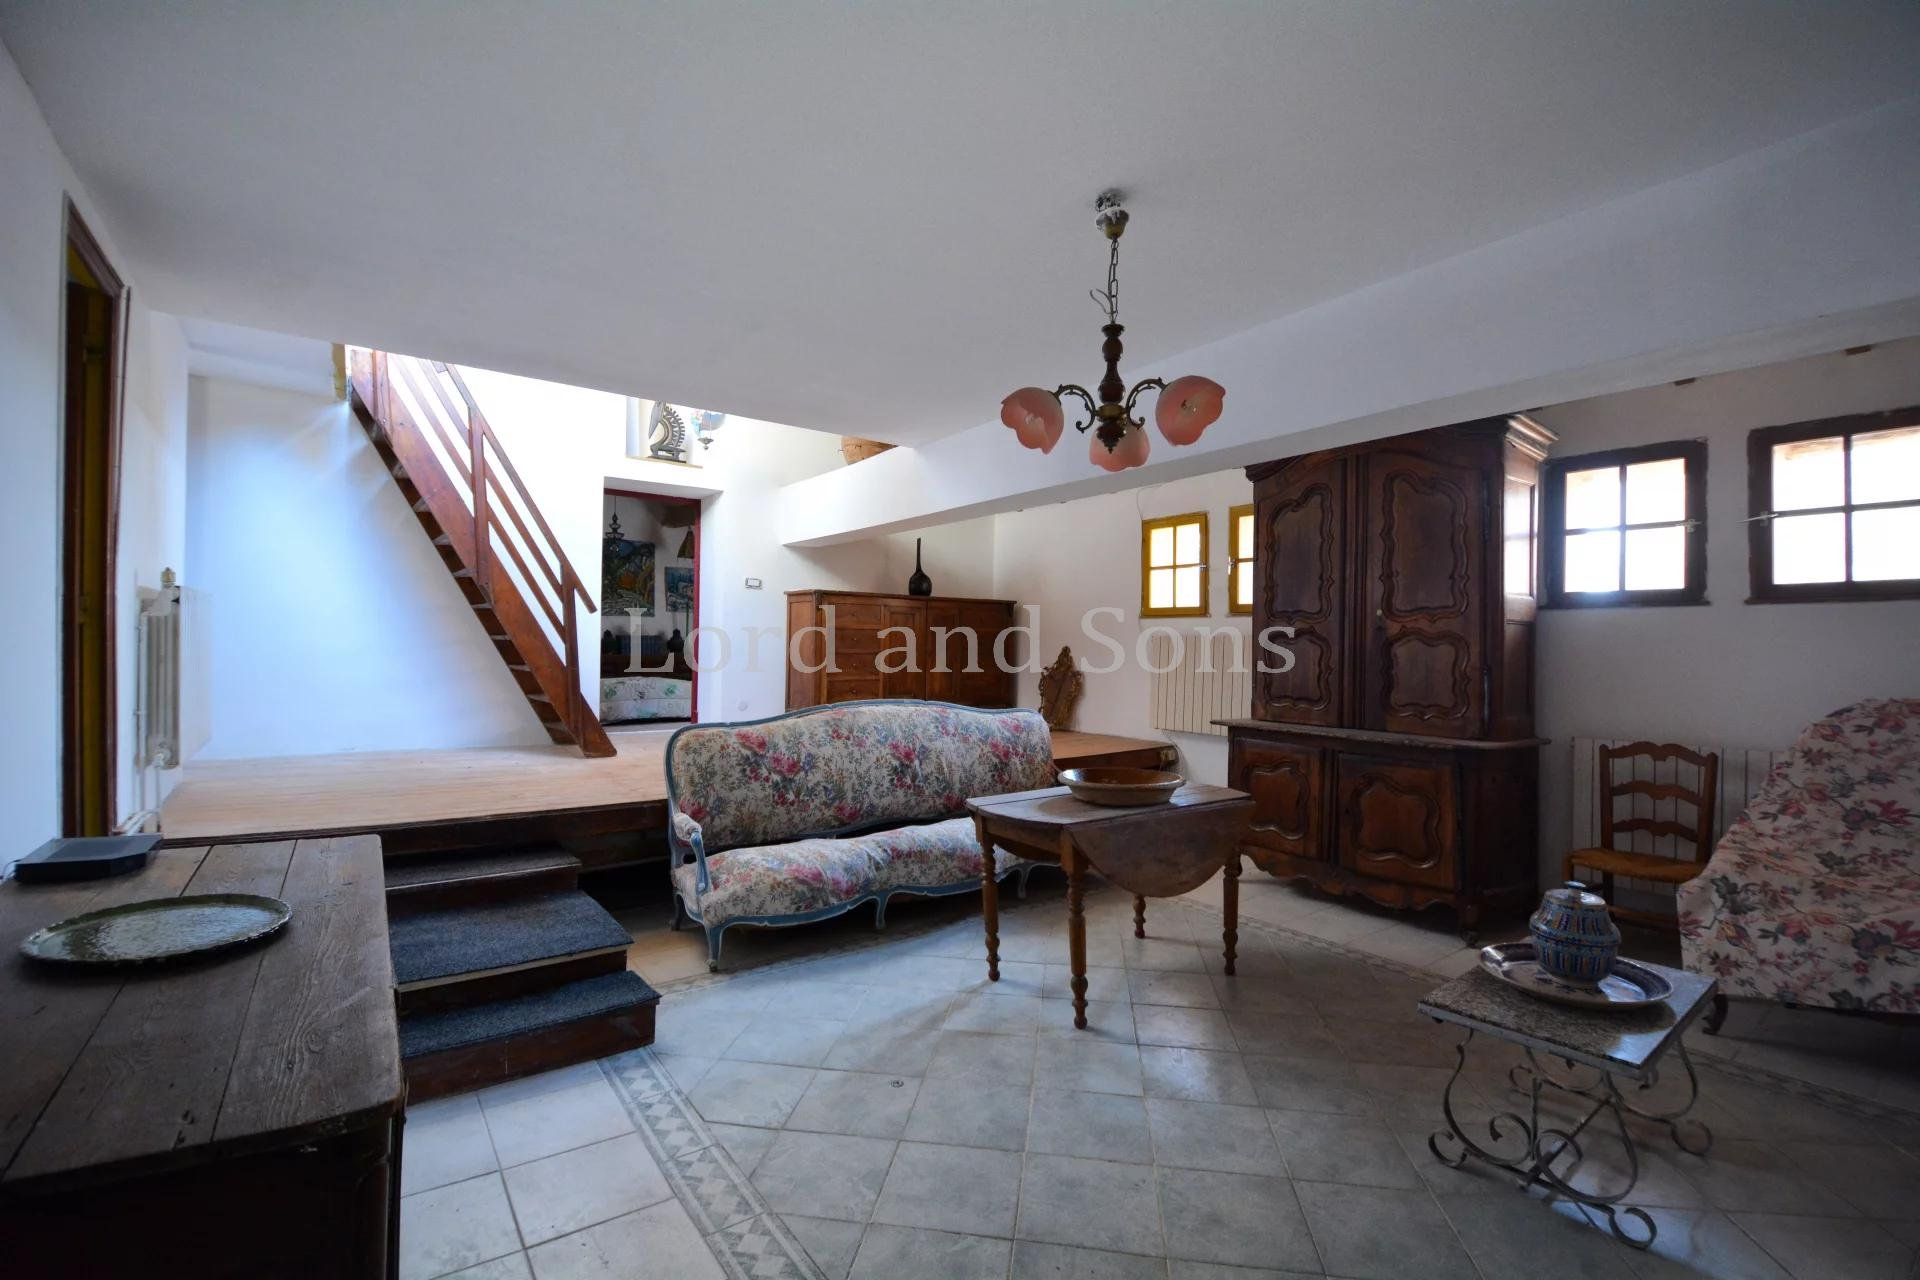 belles demeures de france a vendre